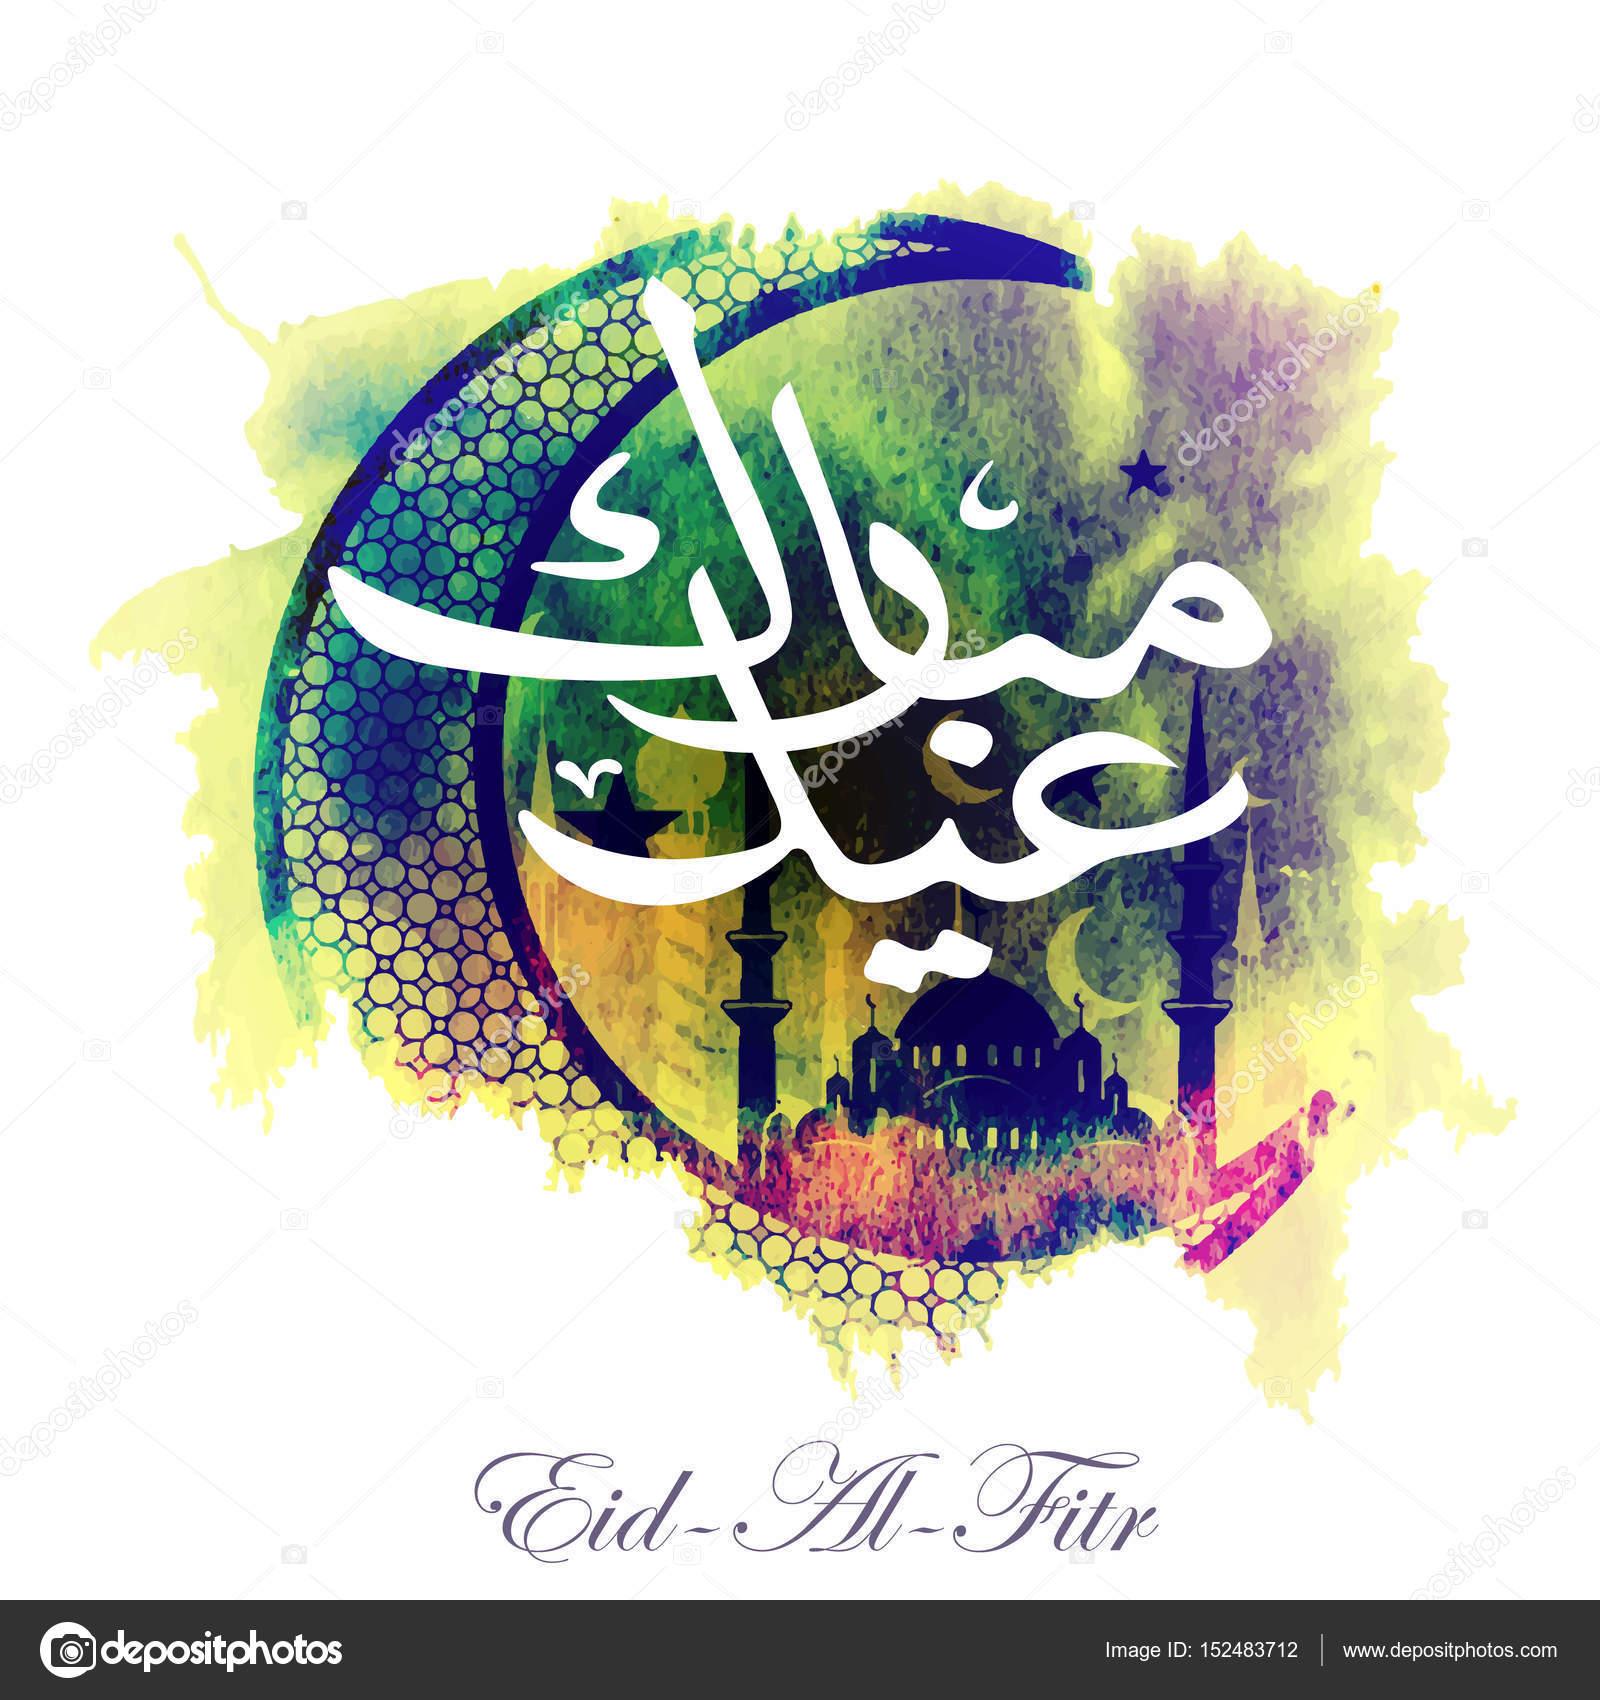 Must see Eid Holiday Eid Al-Fitr Greeting - depositphotos_152483712-stock-illustration-eid-al-fitr-greeting-card  Graphic_592498 .jpg